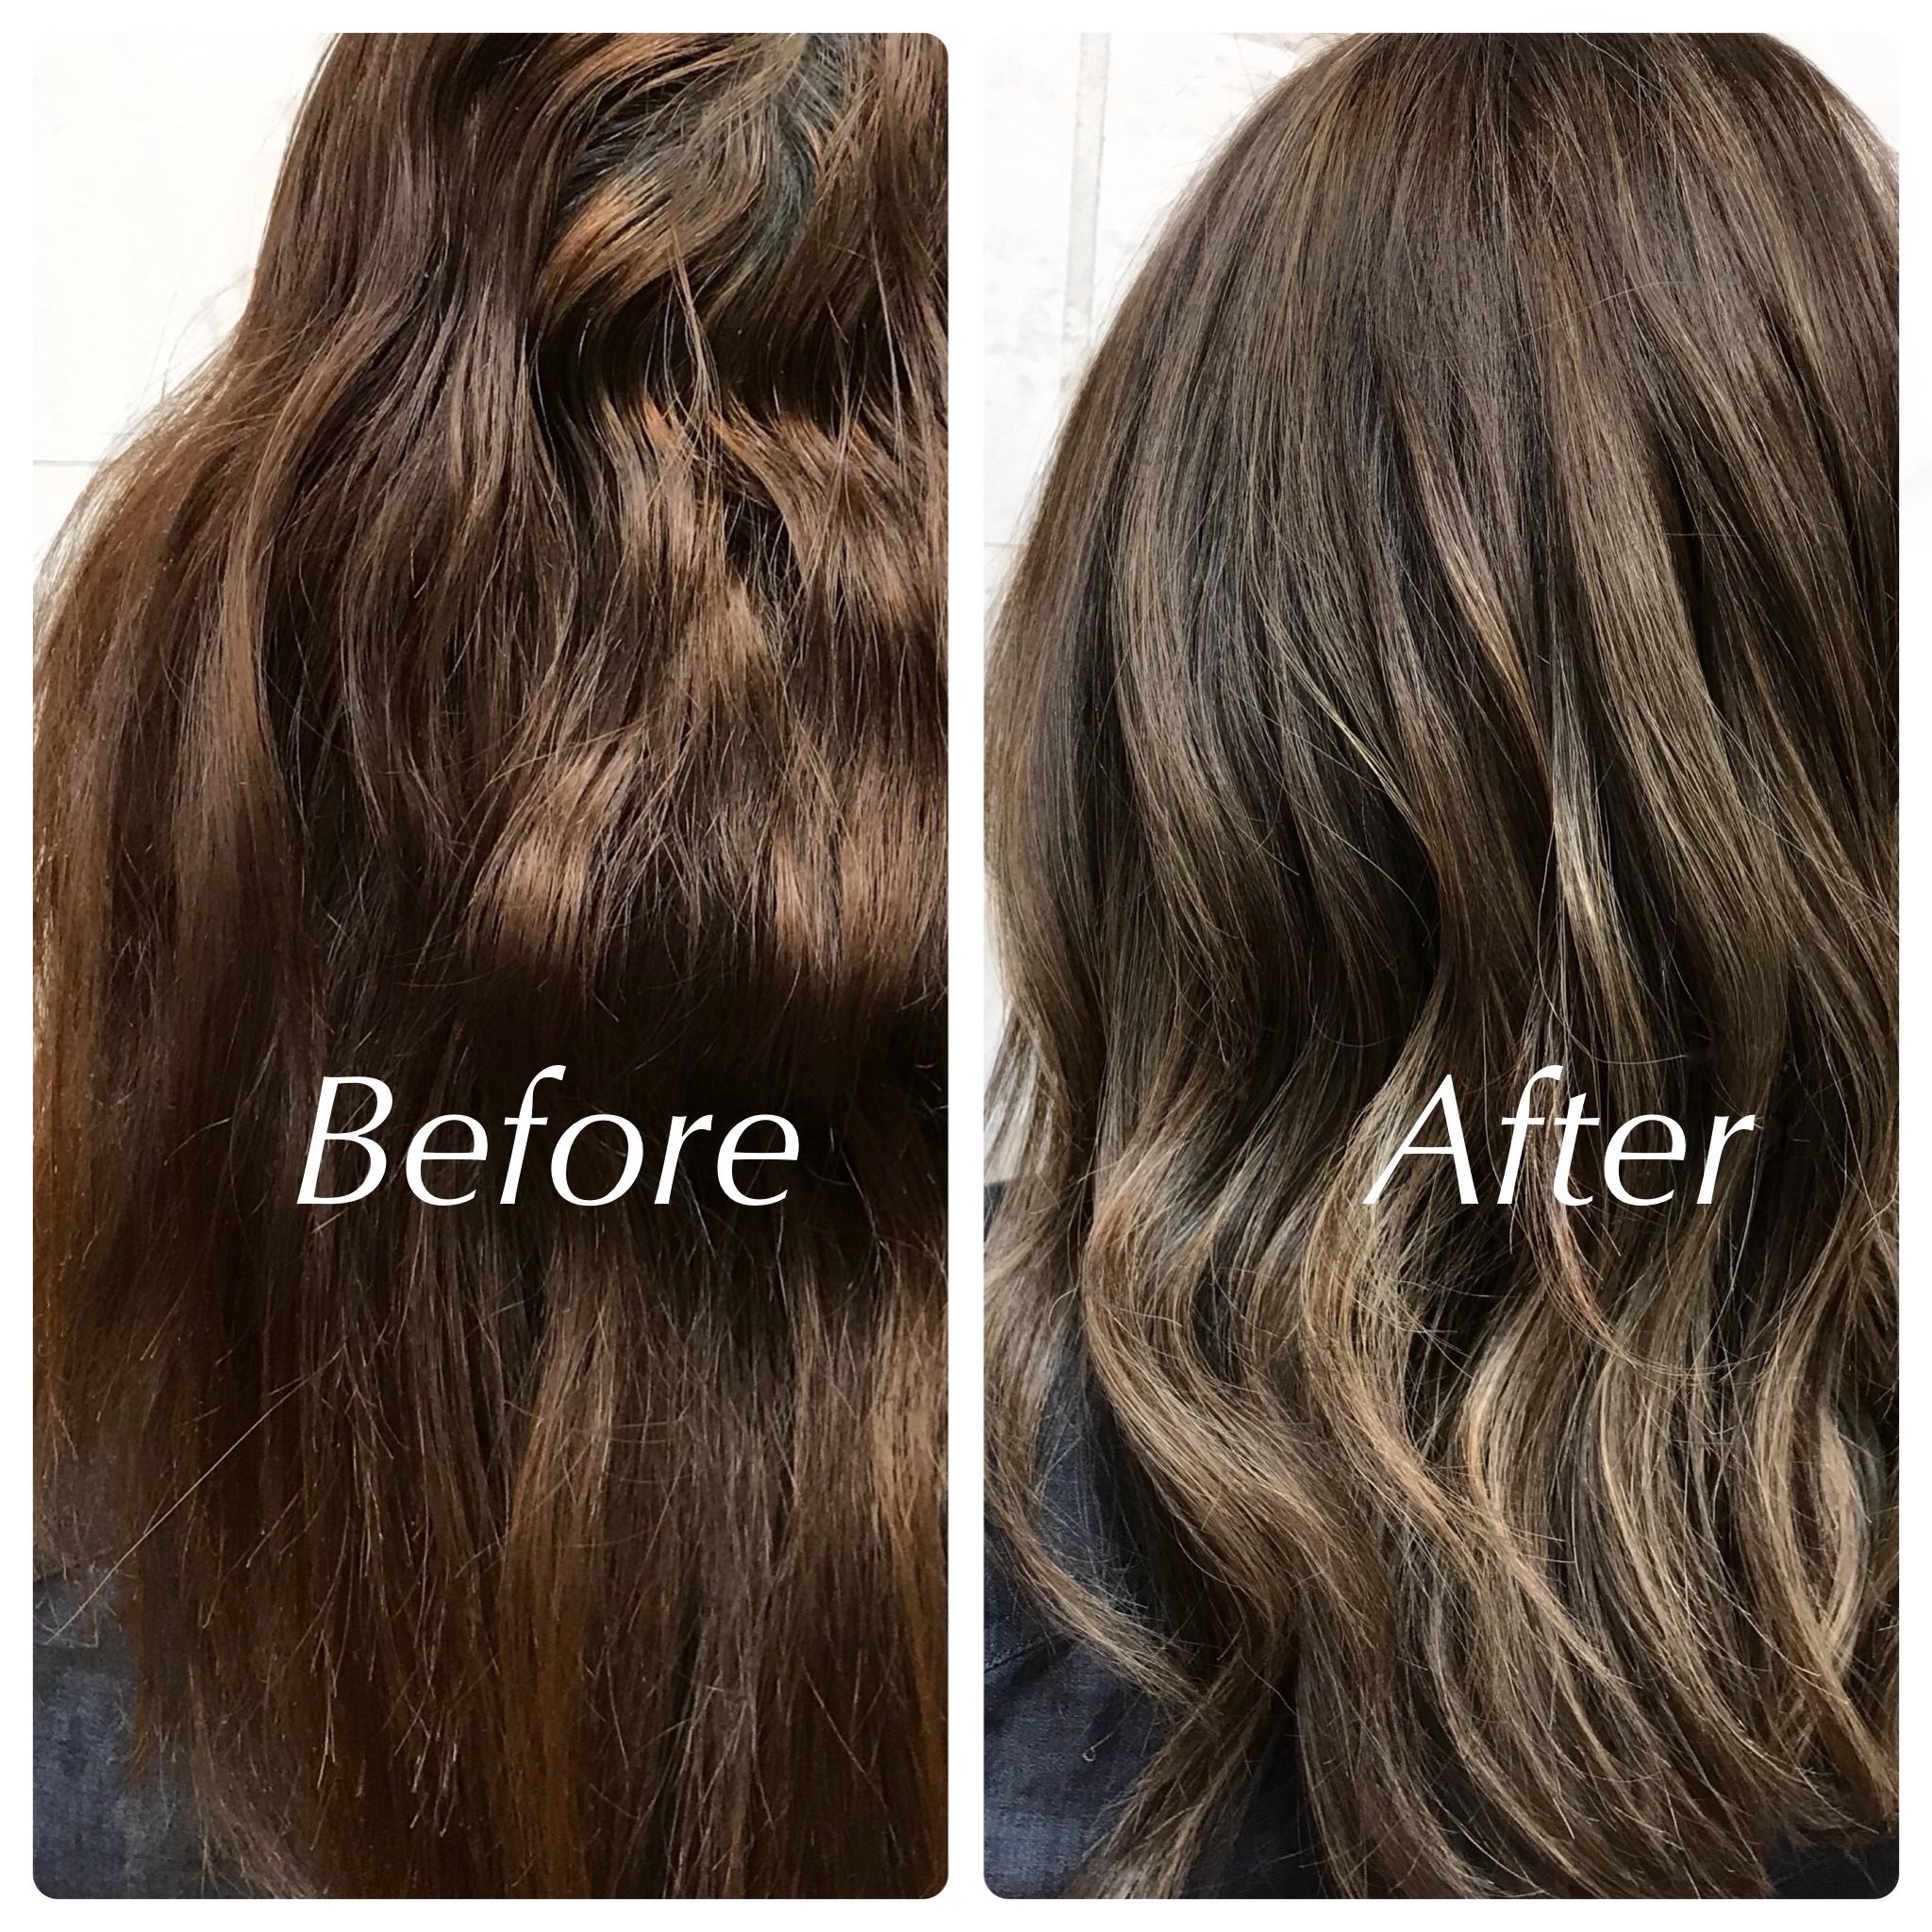 Best hair salon near me, Best balayage in ballantyne, Color correction Charlotte salon, balayage Charlotte , Ballantyne salons, south Charlotte salon , Charlotte colorists